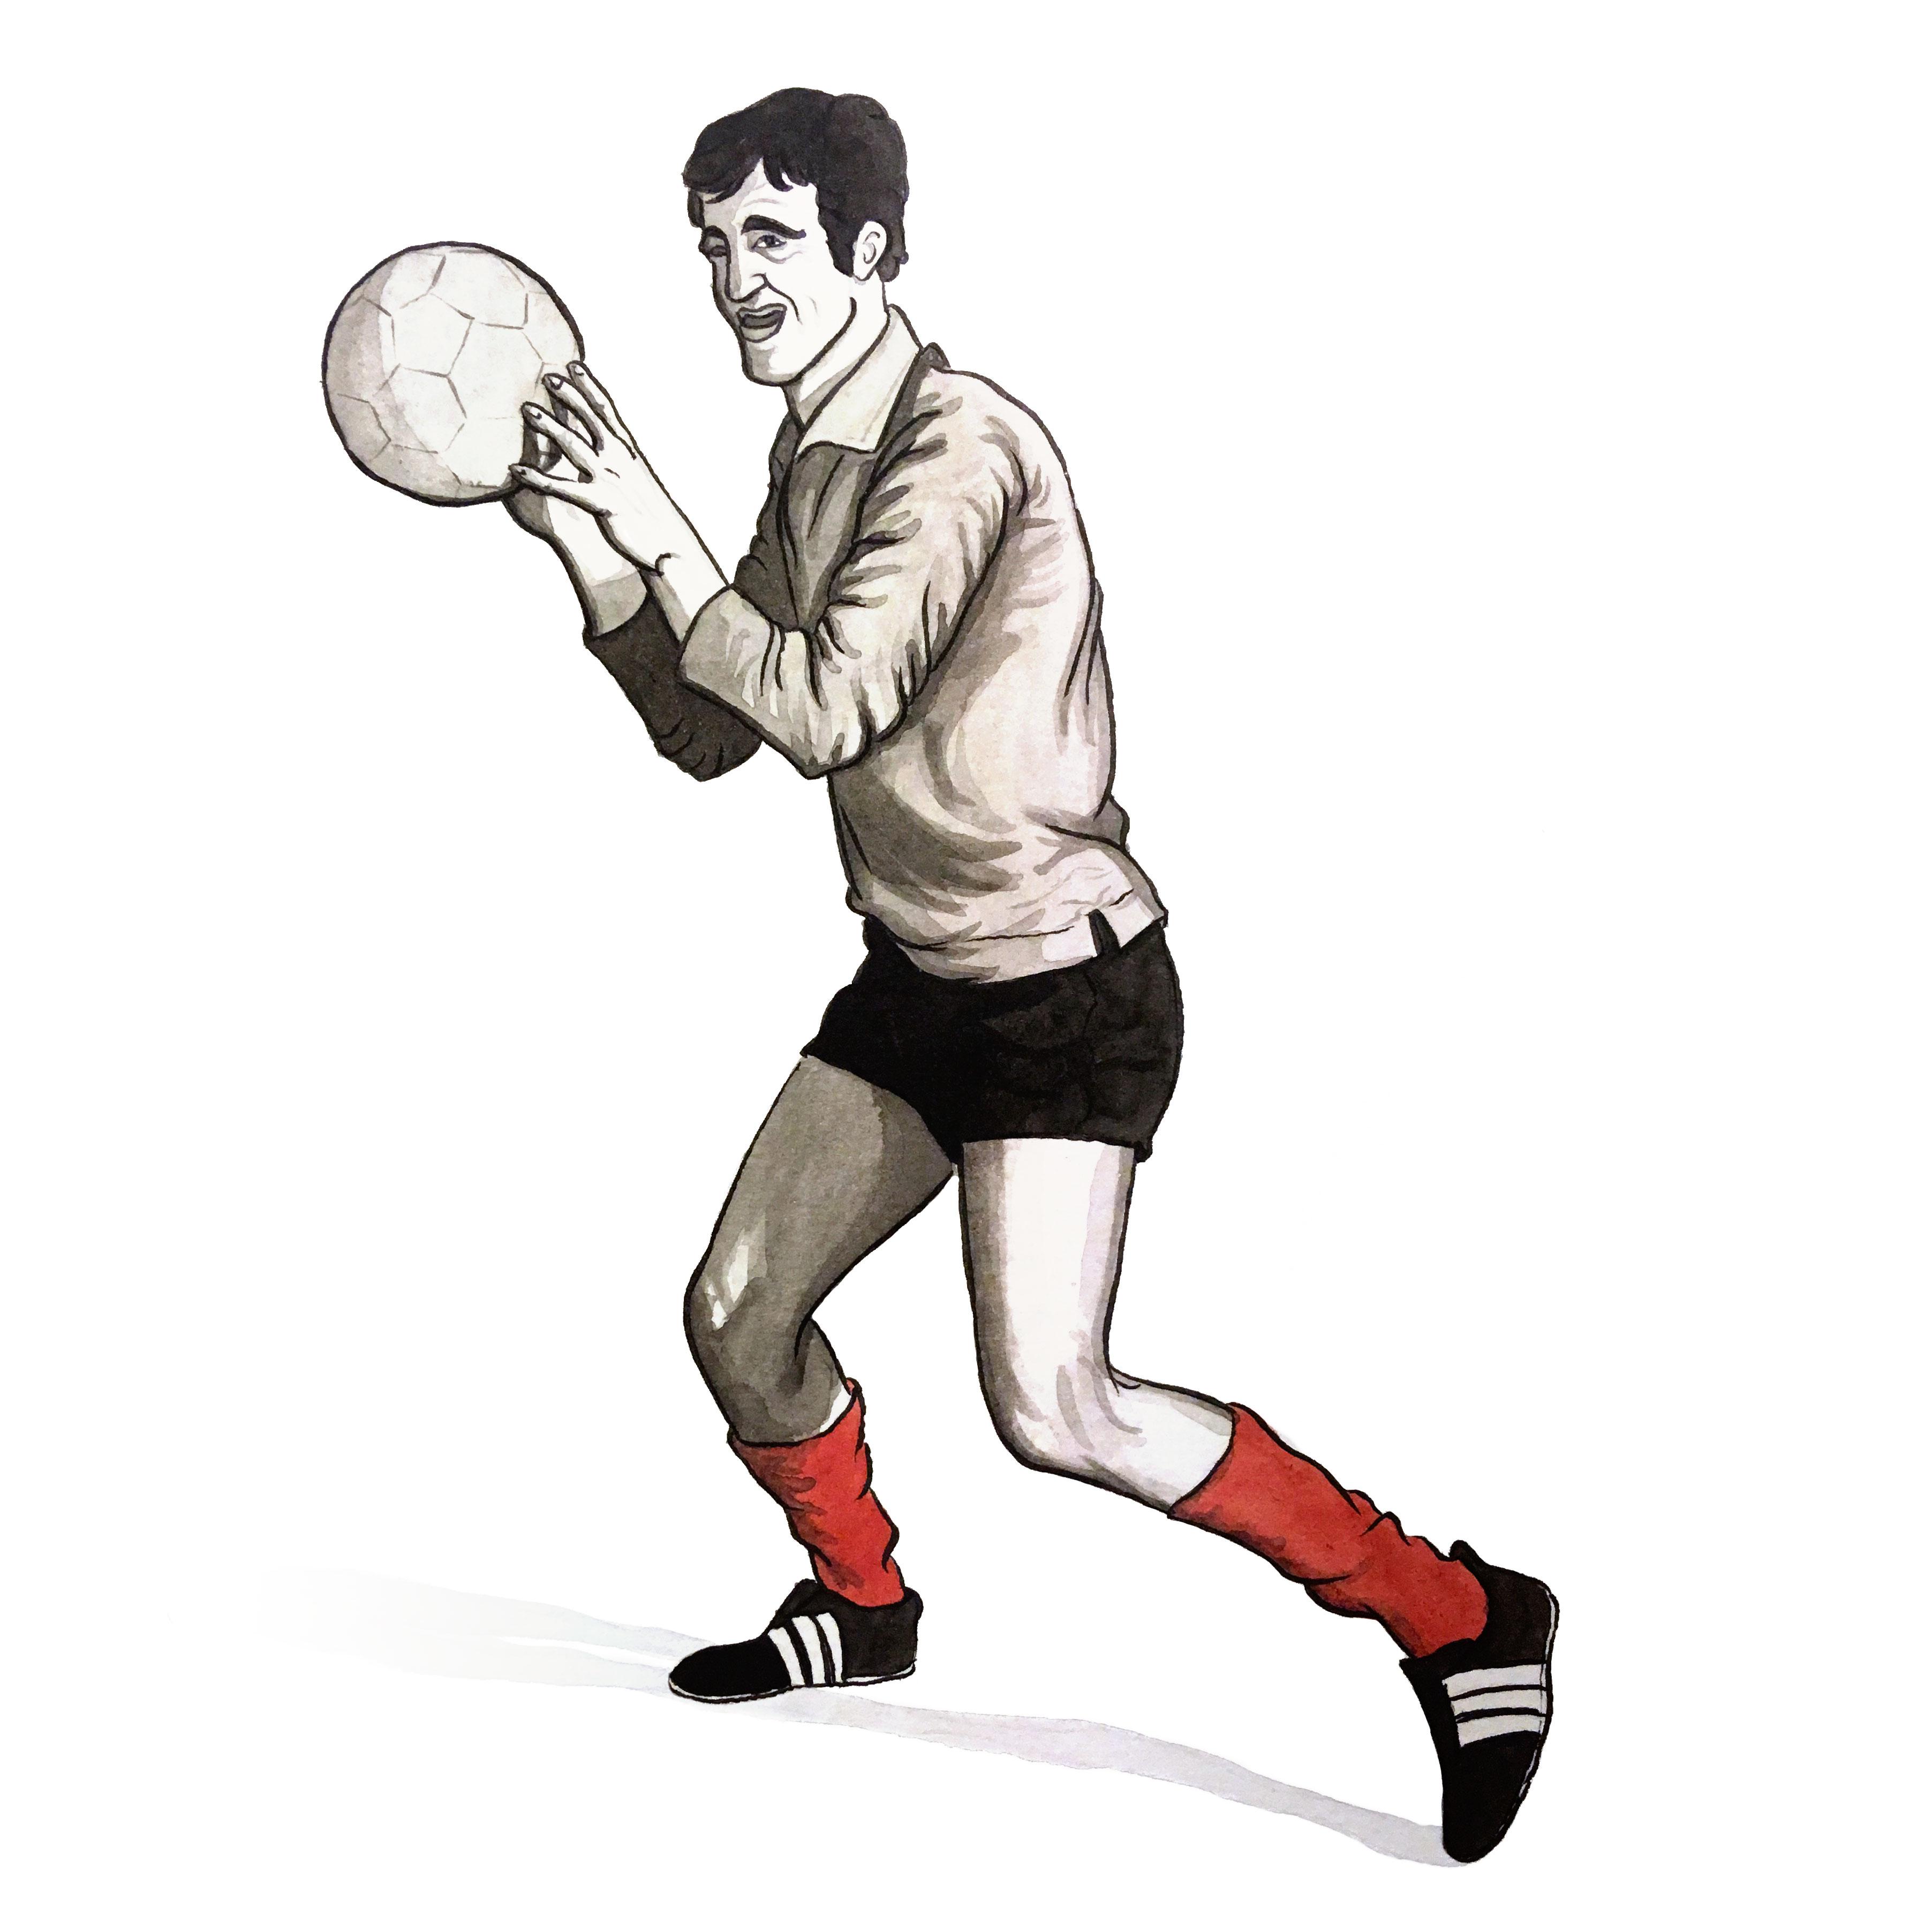 belmondoFootballeur